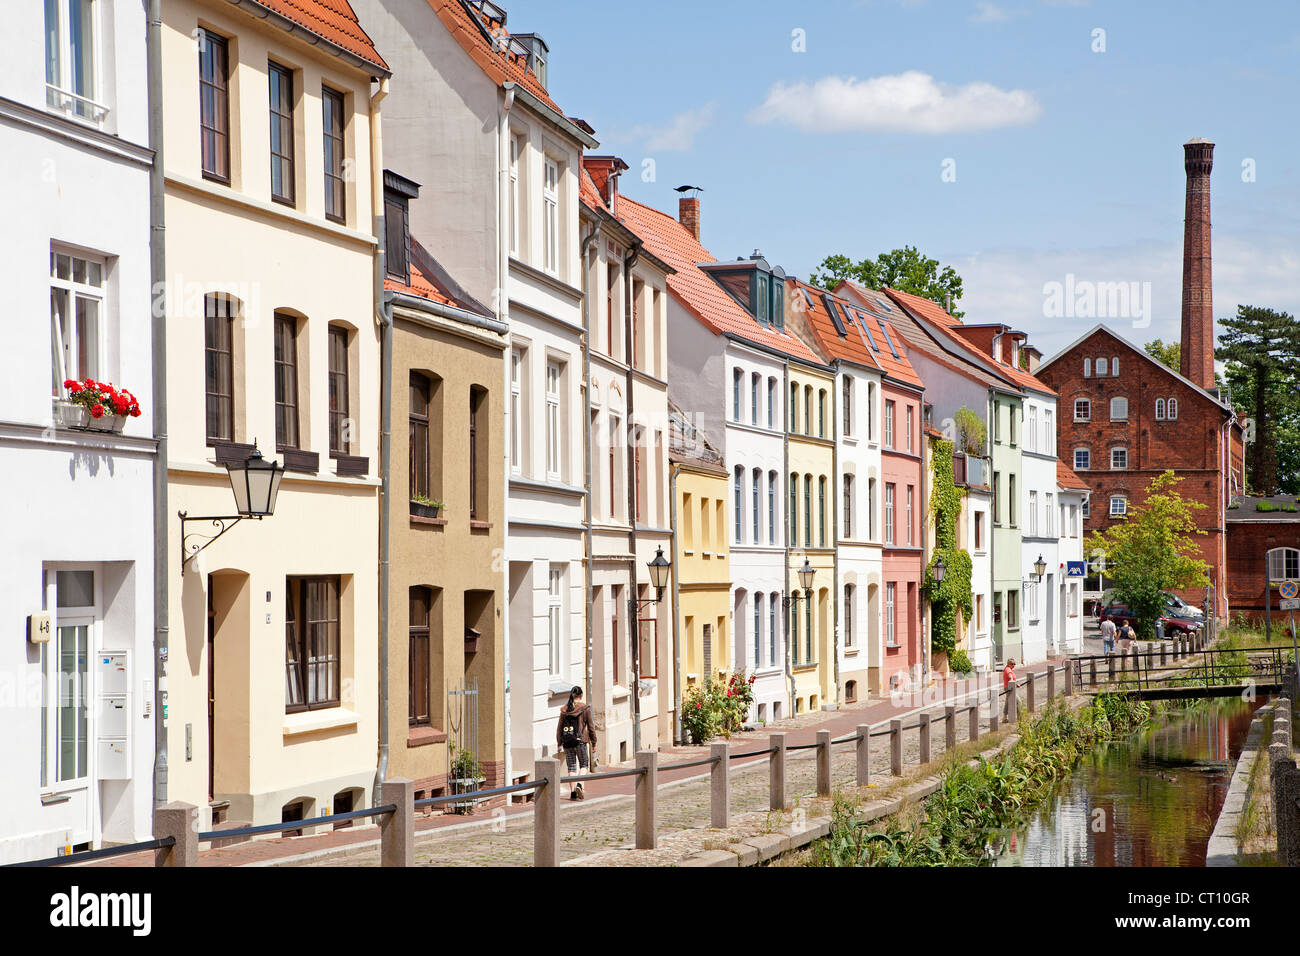 street Muehlengrube, Wismar, Mecklenburg-West Pomerania, Germany - Stock Image